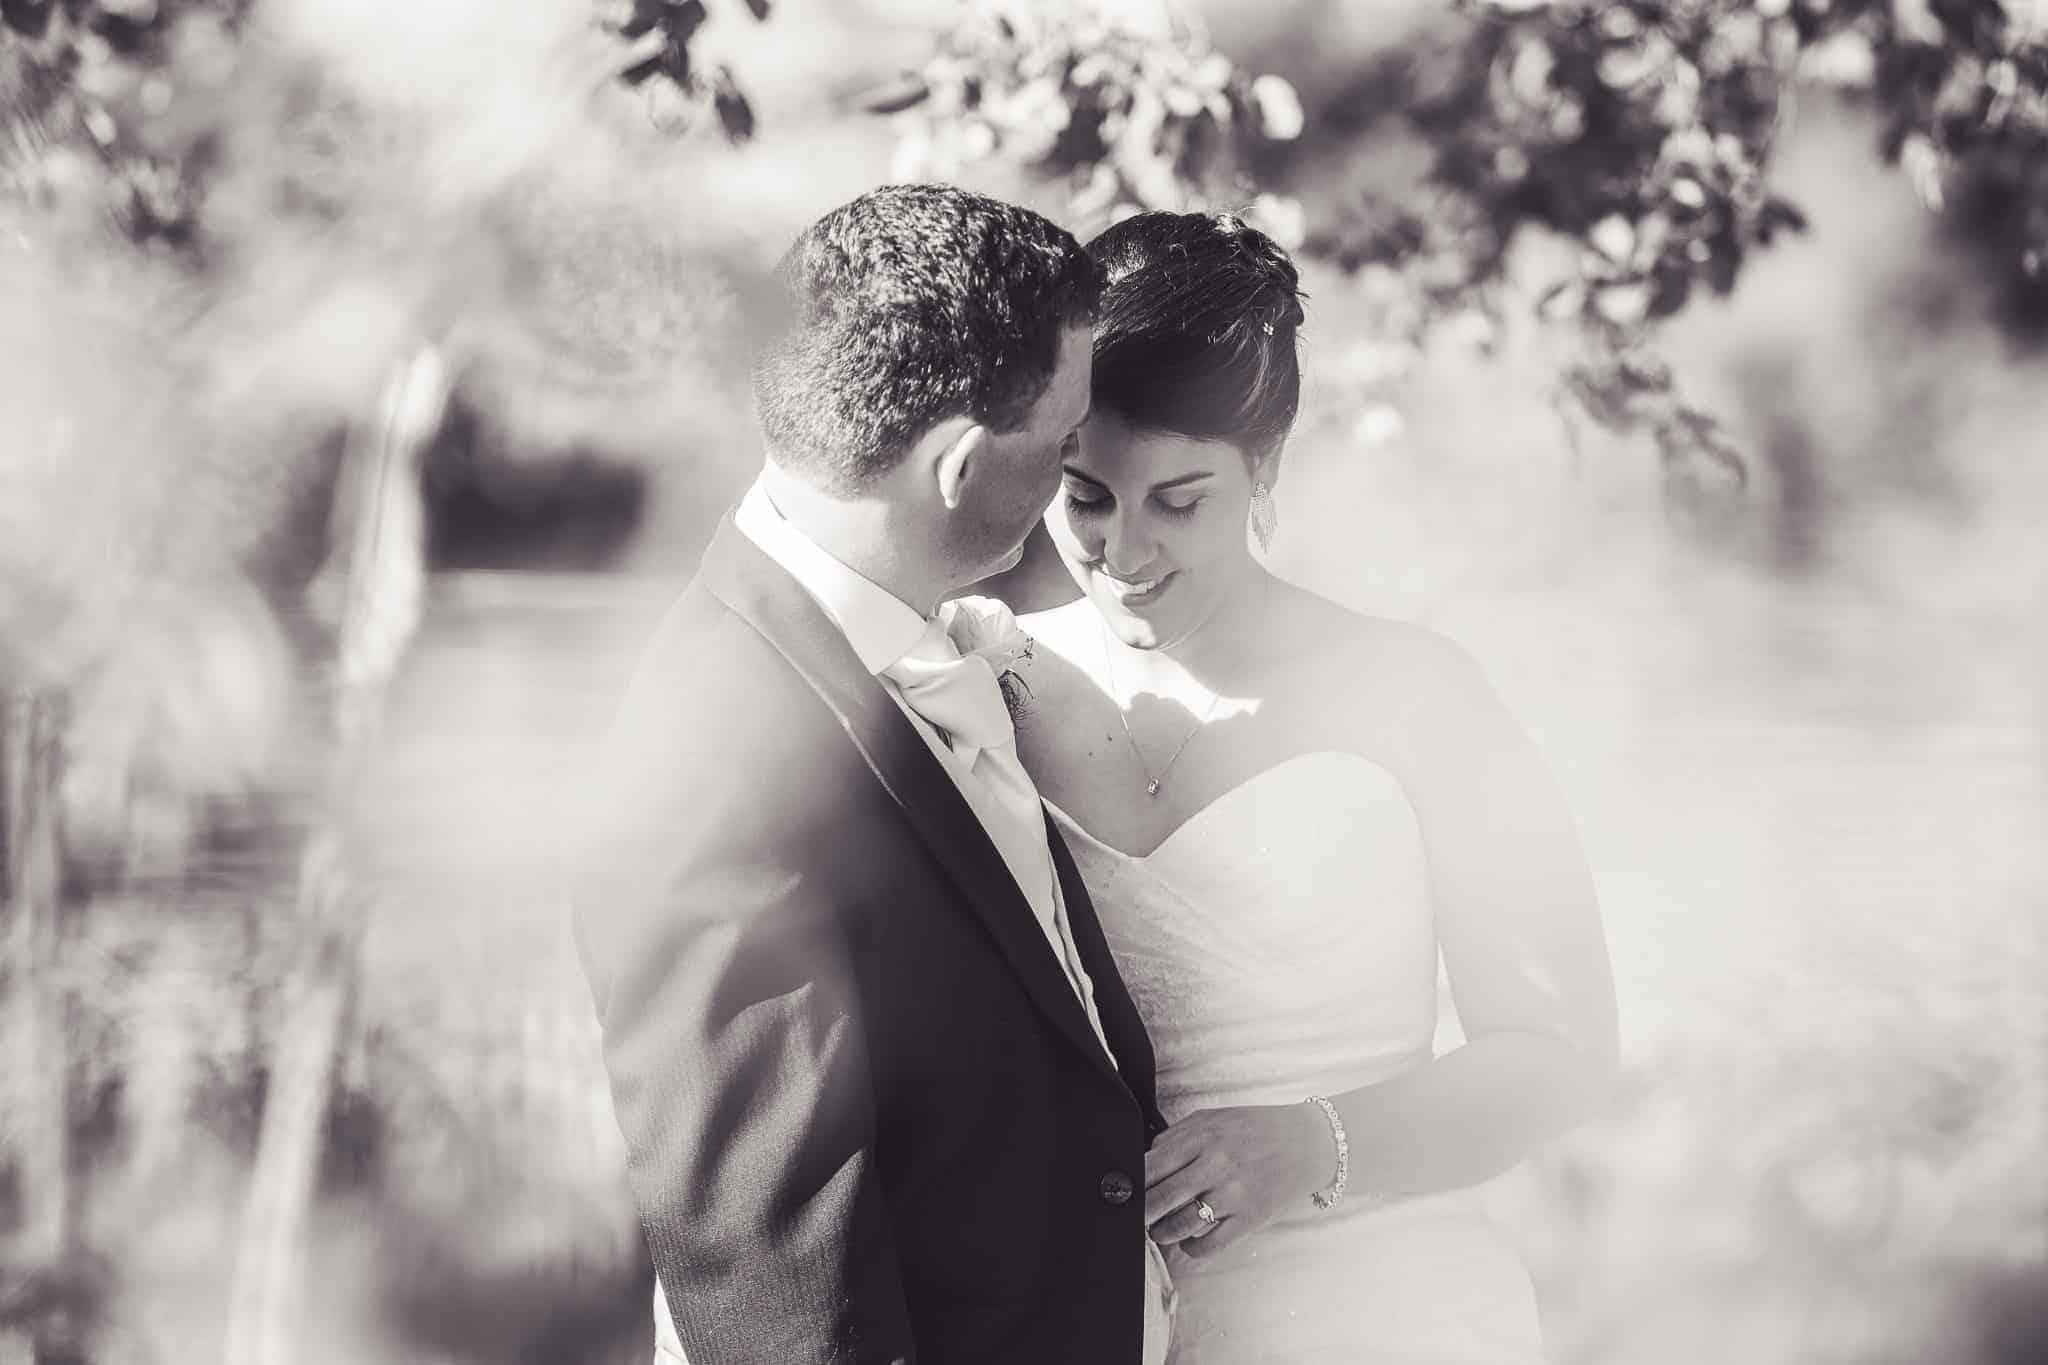 Catherine-George-Wedding-Cannington-Bridgwater-Somerset-Katie-Mortimore-Photography-small-440